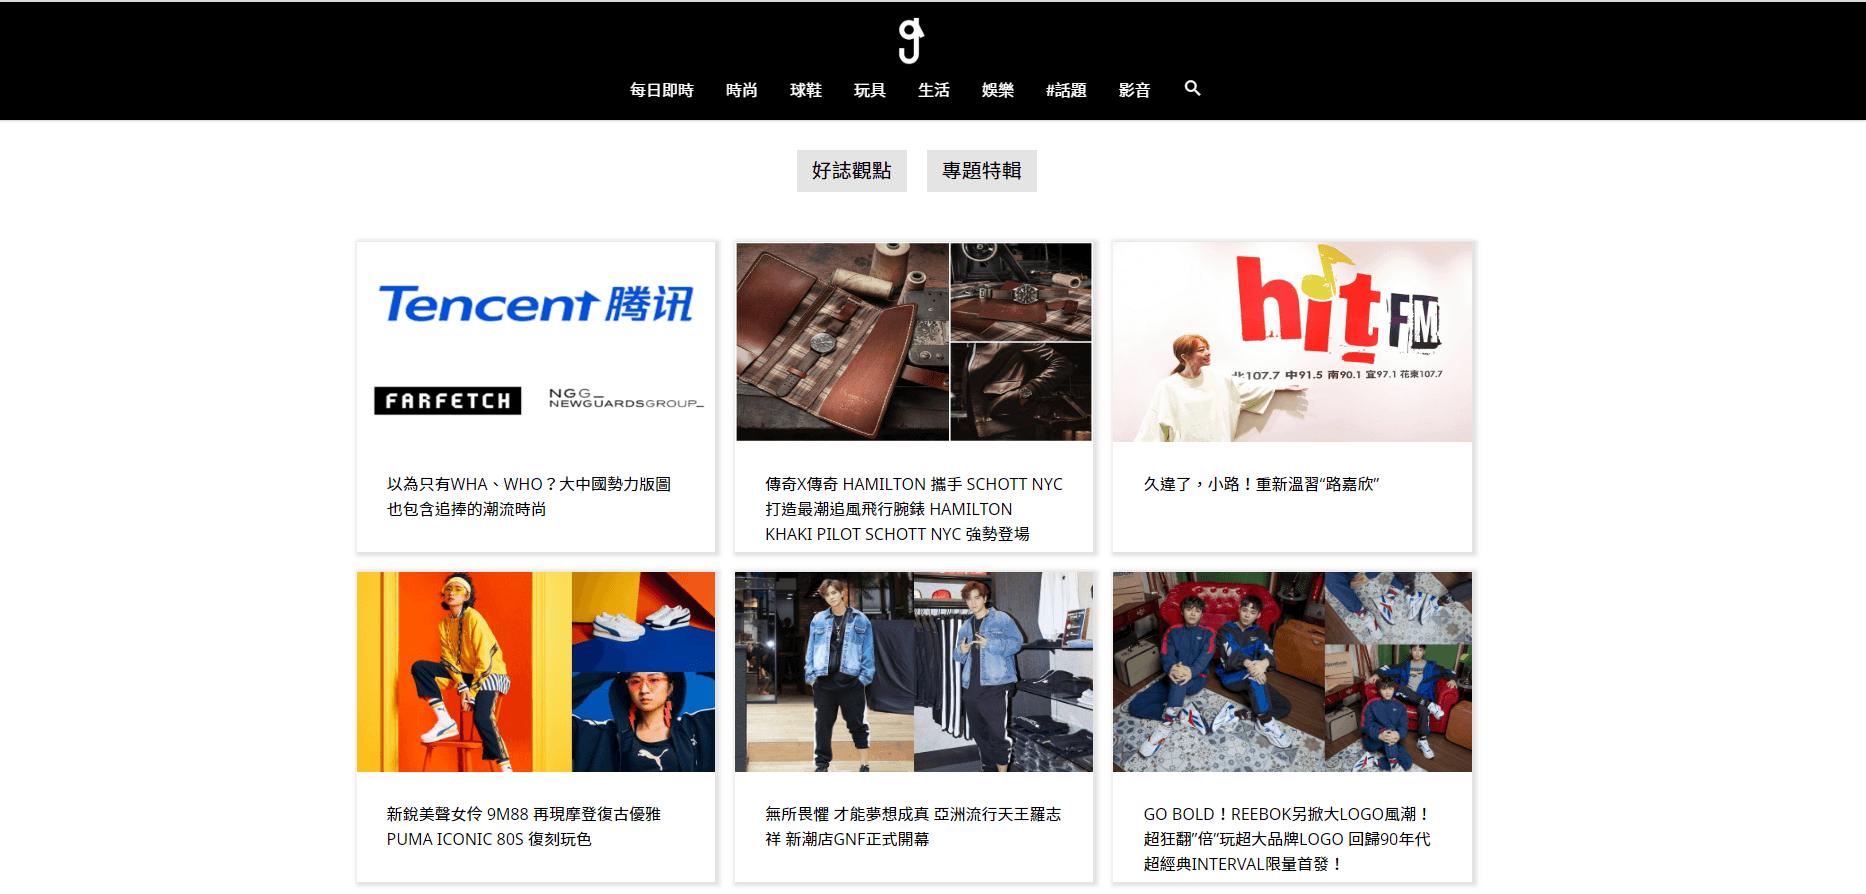 agoodmag追求時尚的新聞媒體-首頁-最新消息02